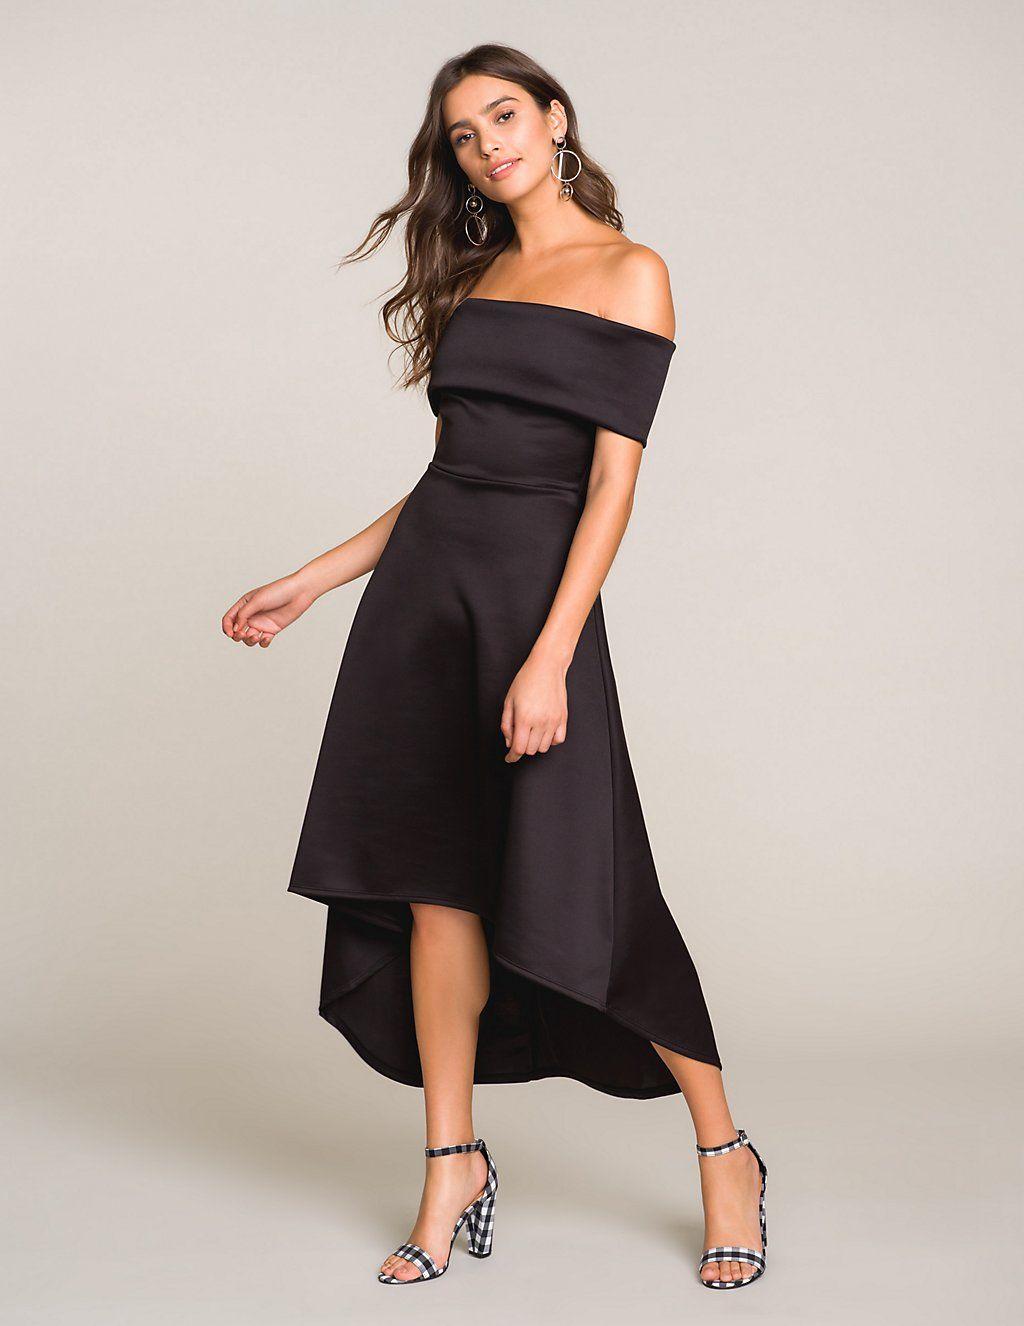 Off The Shoulder High Low Dress Charlotte Russe Dresses Hi Low Dresses Fashion [ 1326 x 1024 Pixel ]